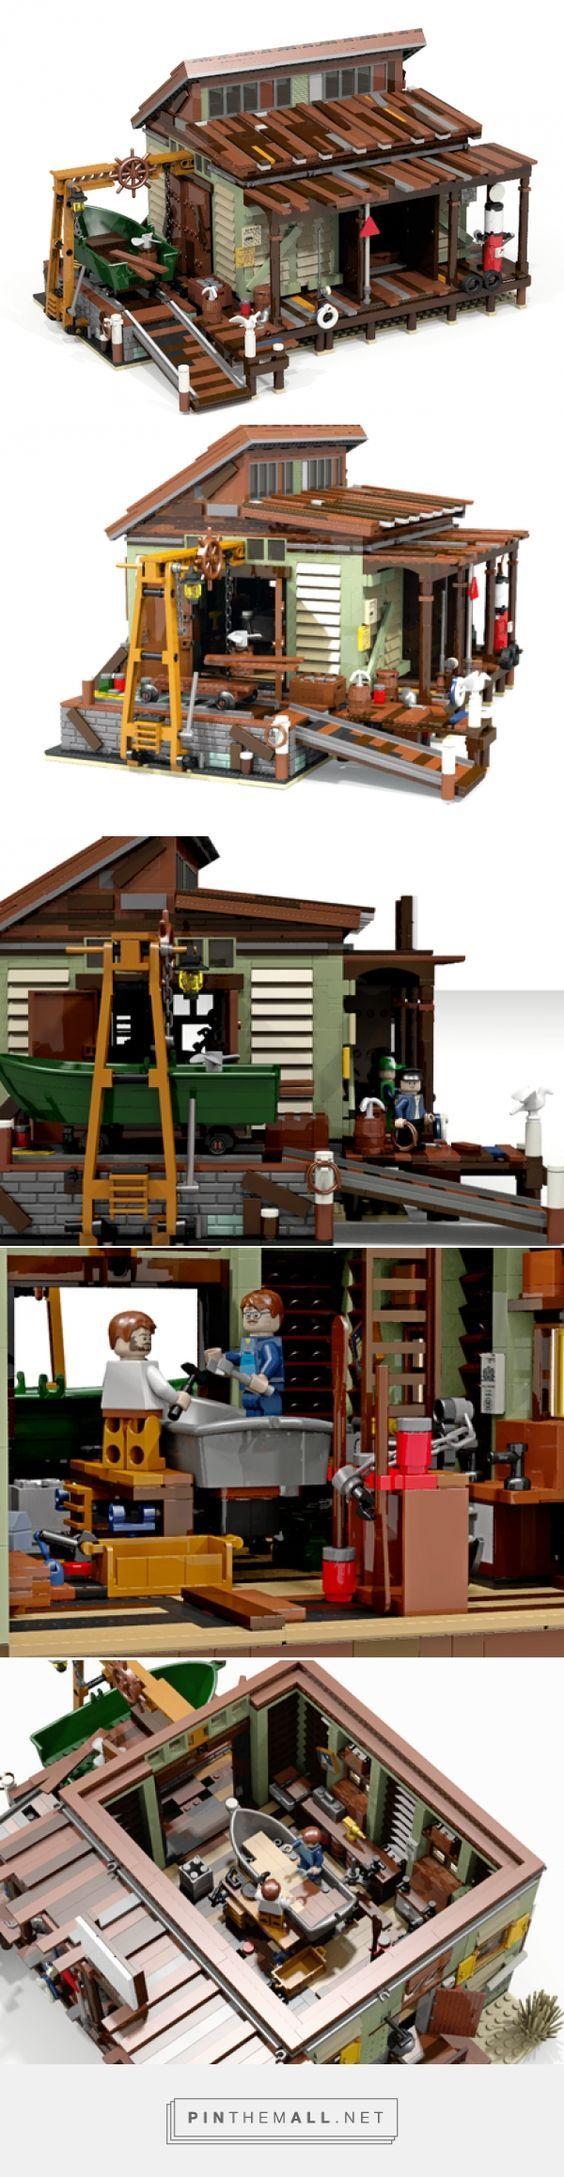 LEGO Ideas - Boat Repair Shop - created via https://pinthemall.net: